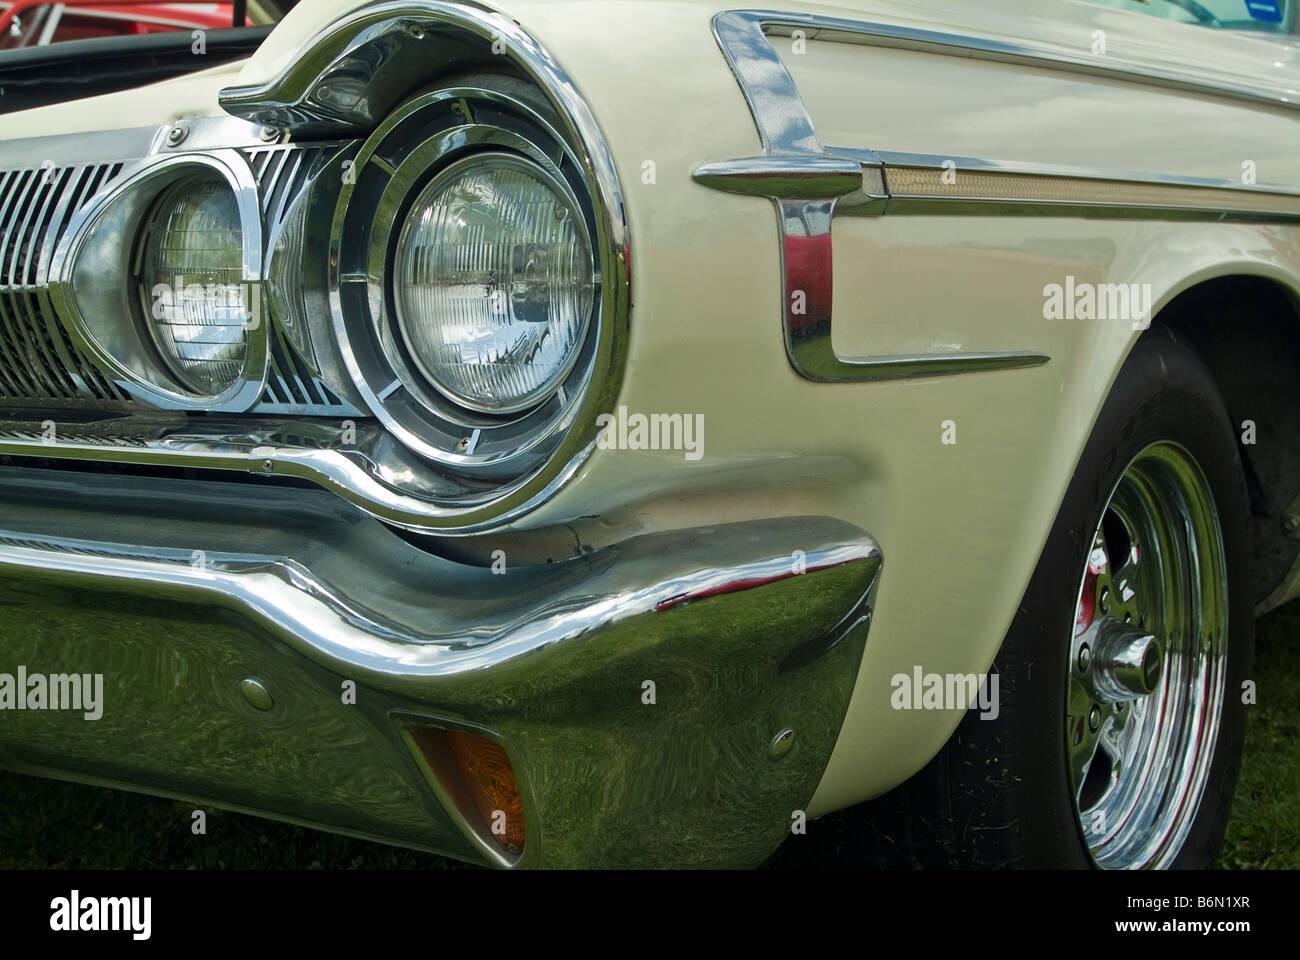 1964 Dodge Polara 500 Modified Street Machine Classic Vintage ...